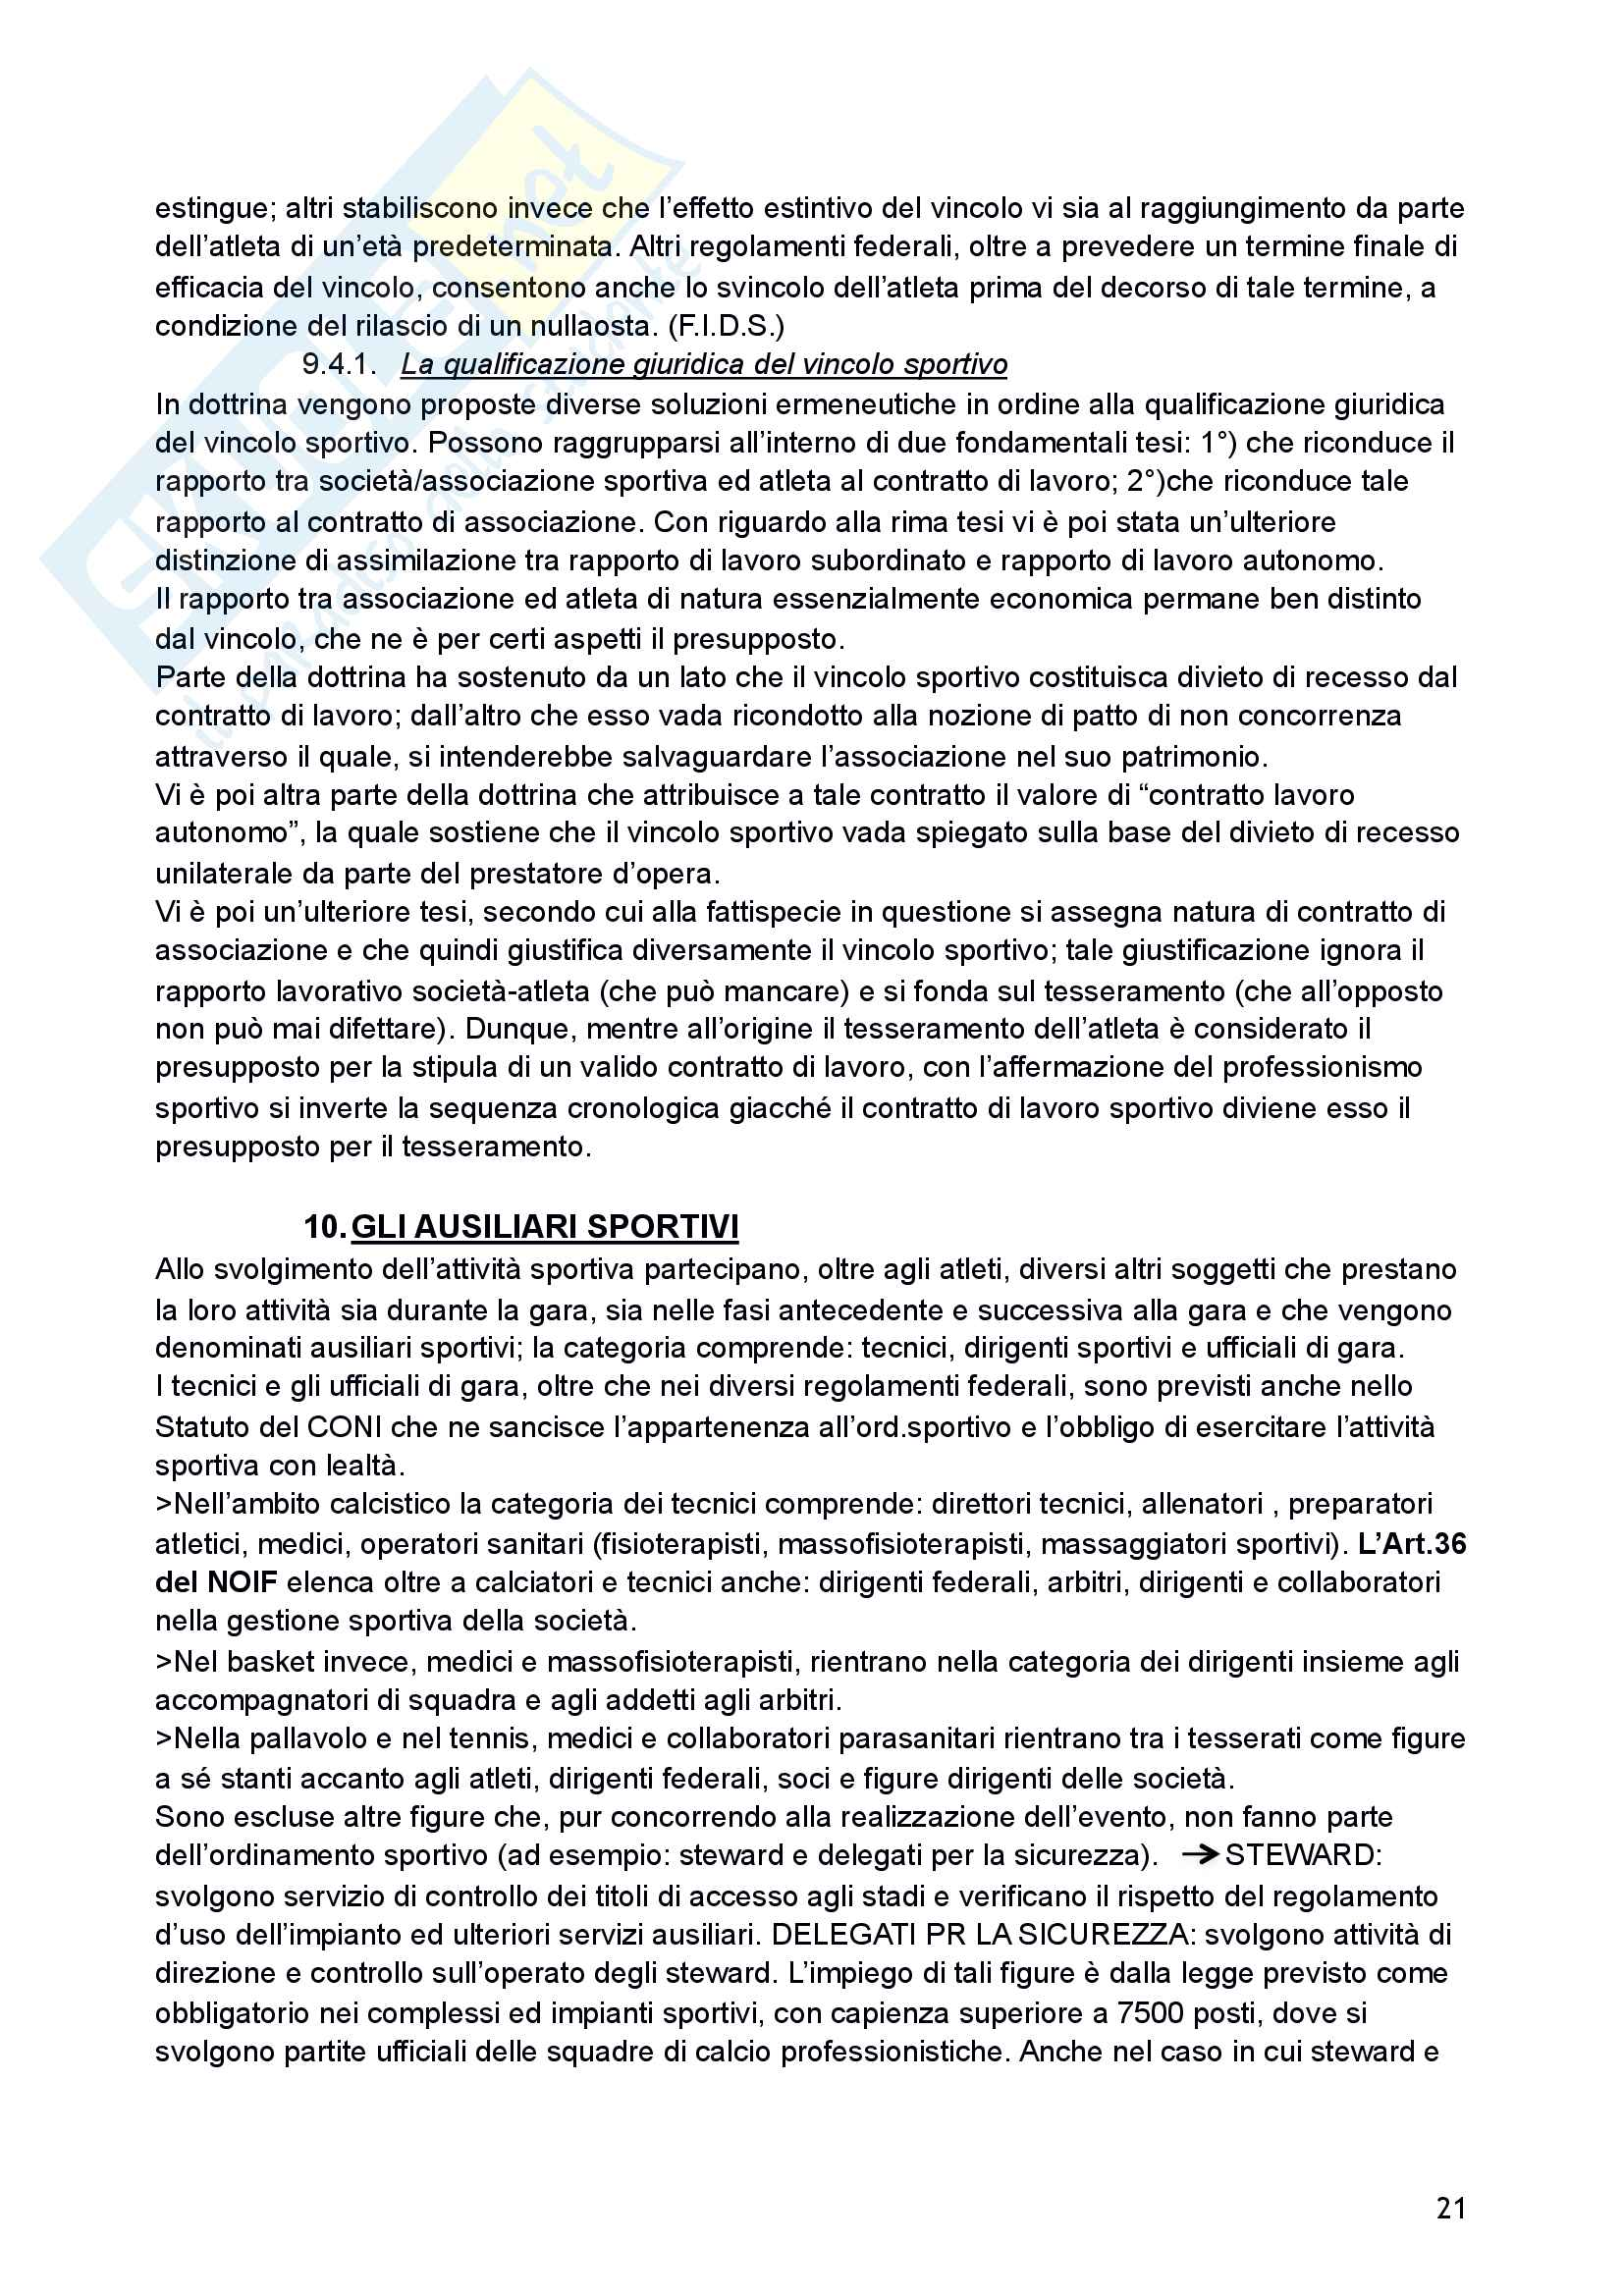 Riassunto esame di Diritto sportivo Pag. 21